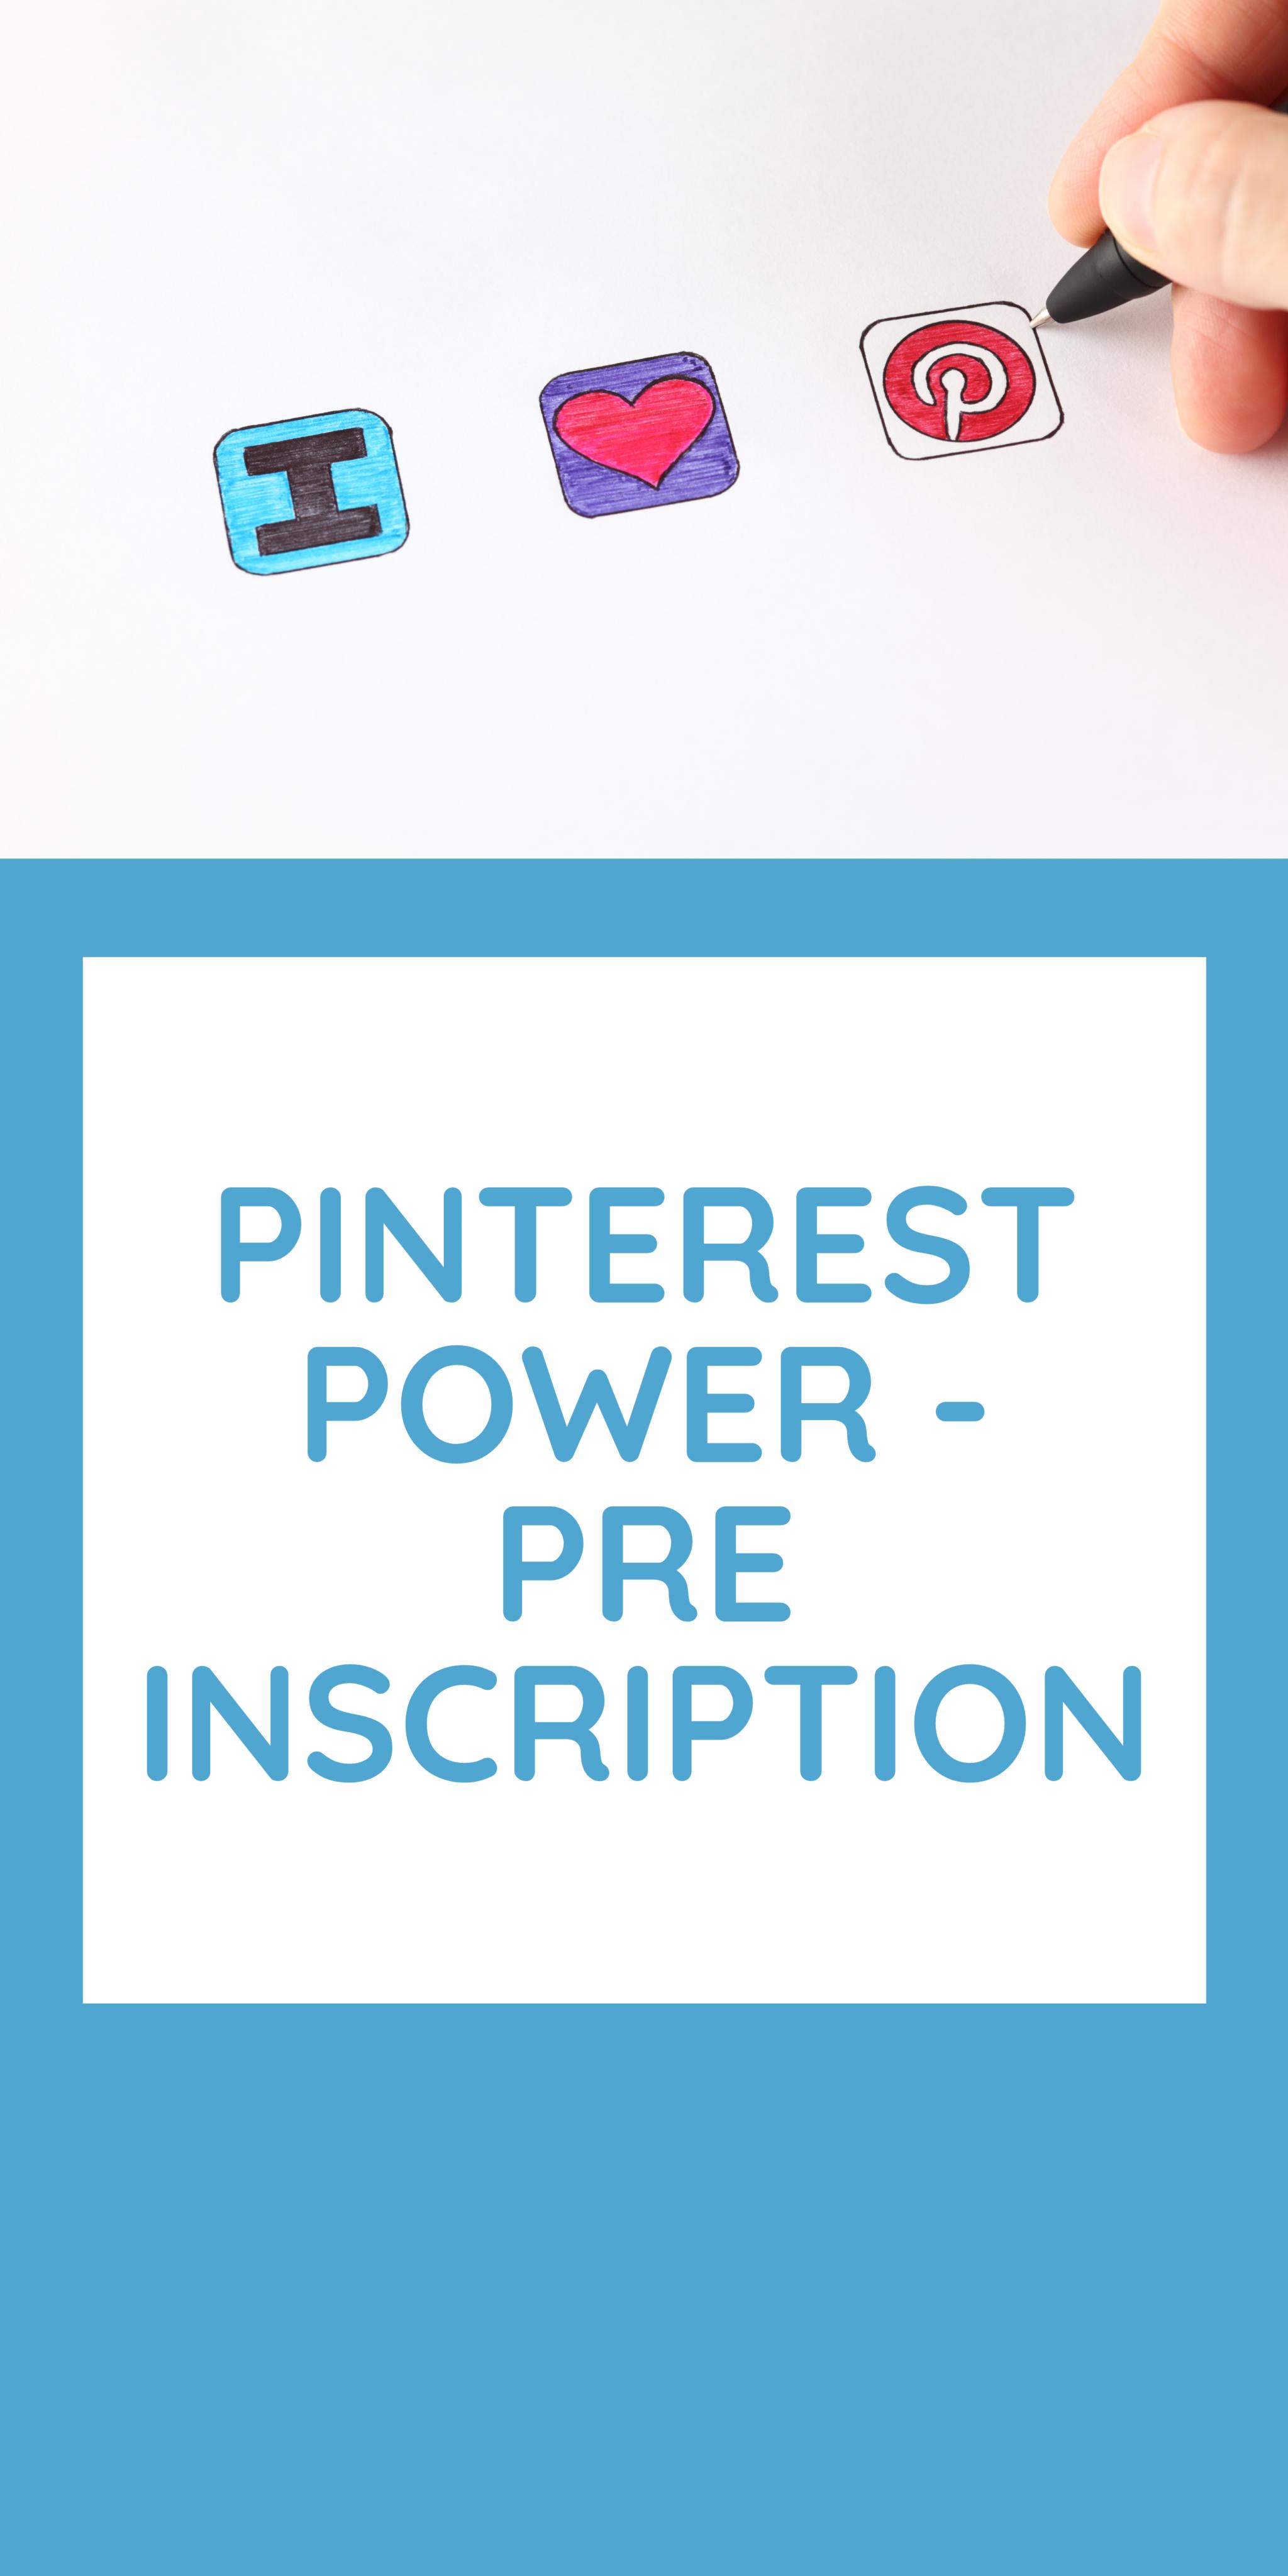 Marjency - atelier pinterest power pré inscription